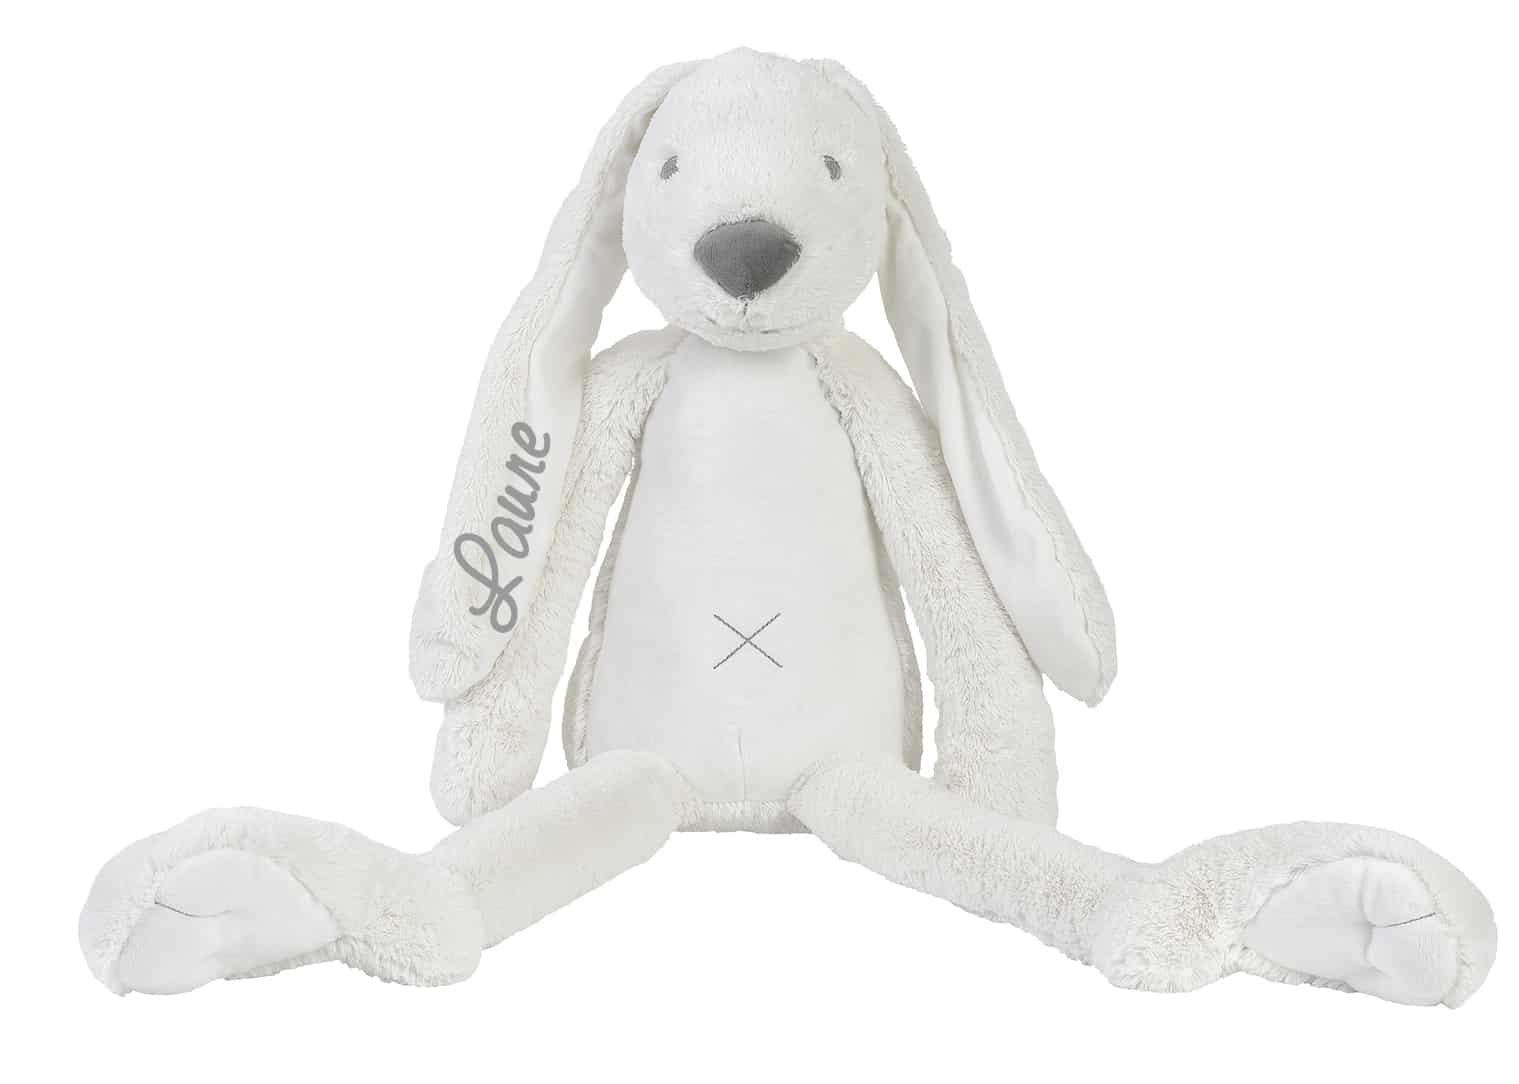 GIANT Rabbit Richie knuffel met naam Ivory / wit (Happy-Horse)